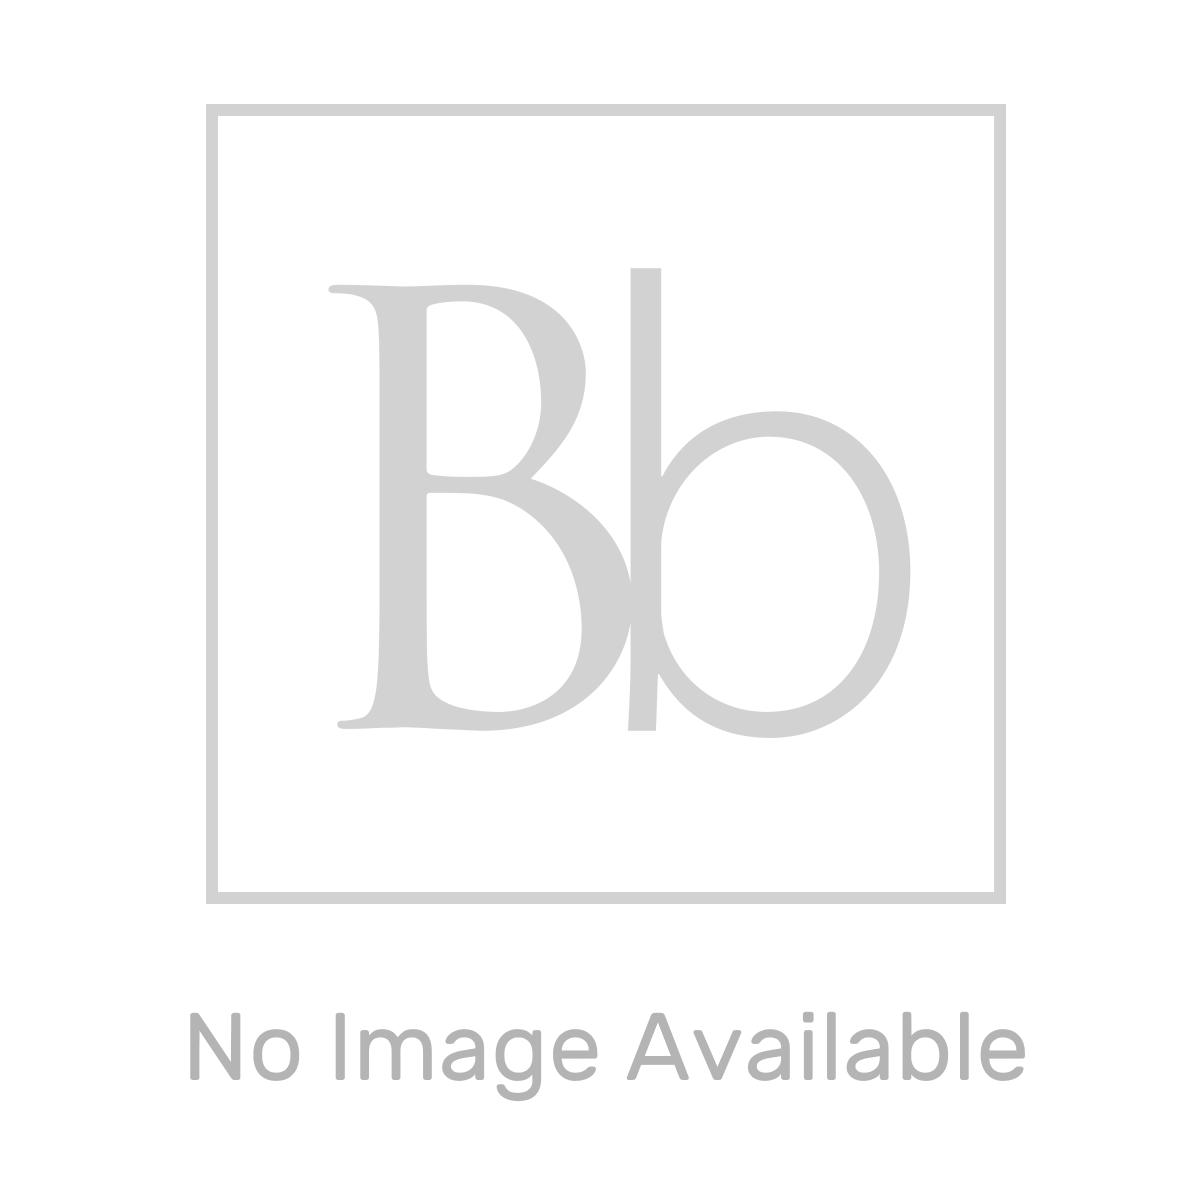 RAK Ecofix Matt Chrome Flush Plate with Round Push Buttons